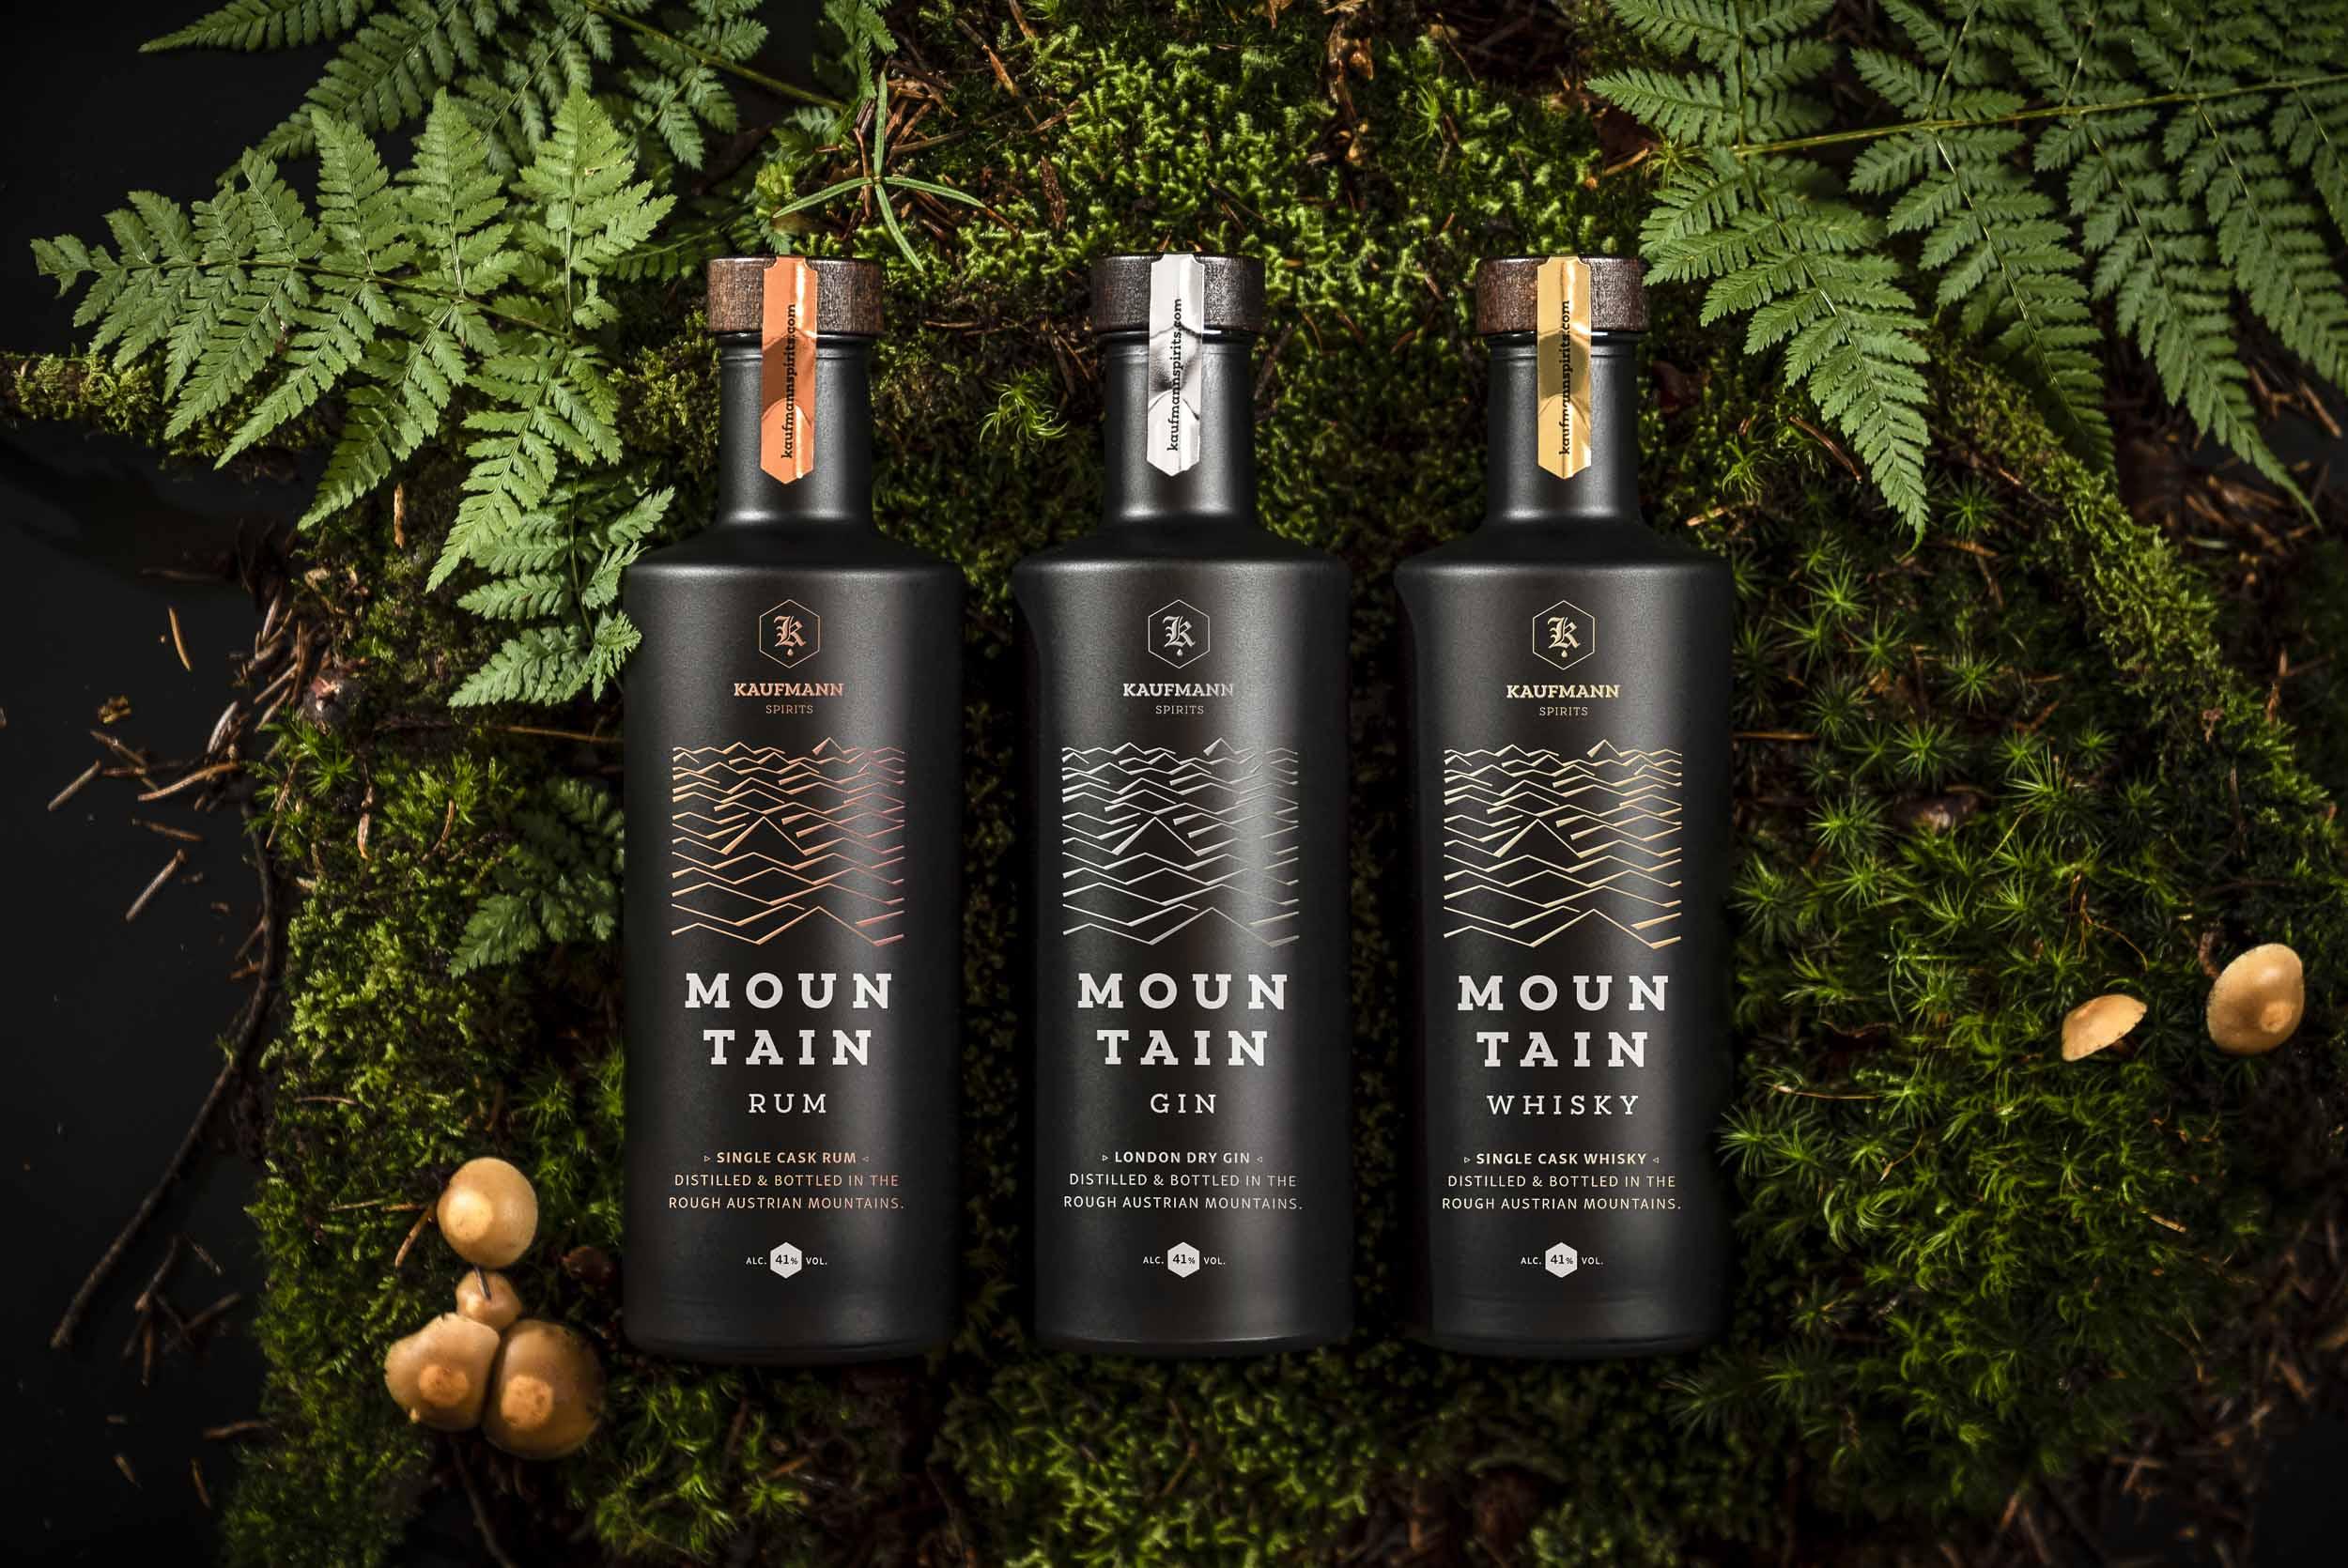 Mountain Gin, Mountain Rum, Mountain Whisky in Moos gebettet.